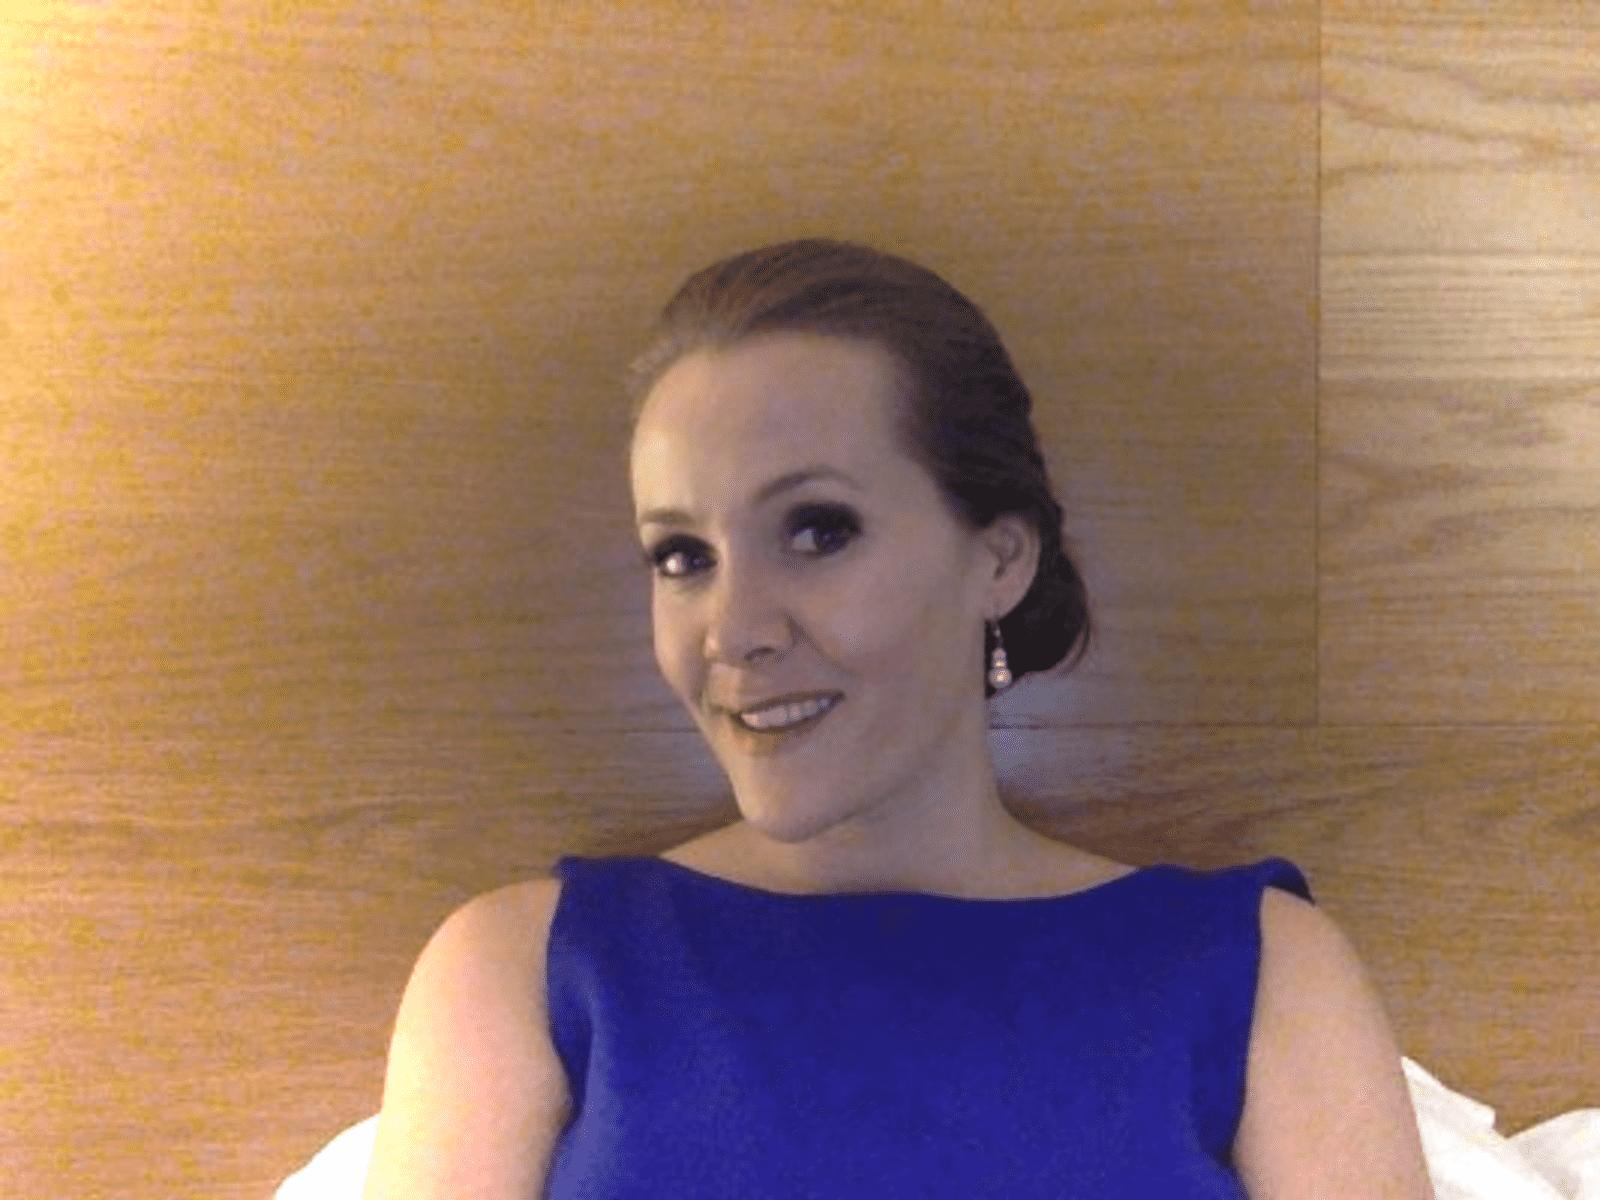 Caroline from Gold Coast, Queensland, Australia